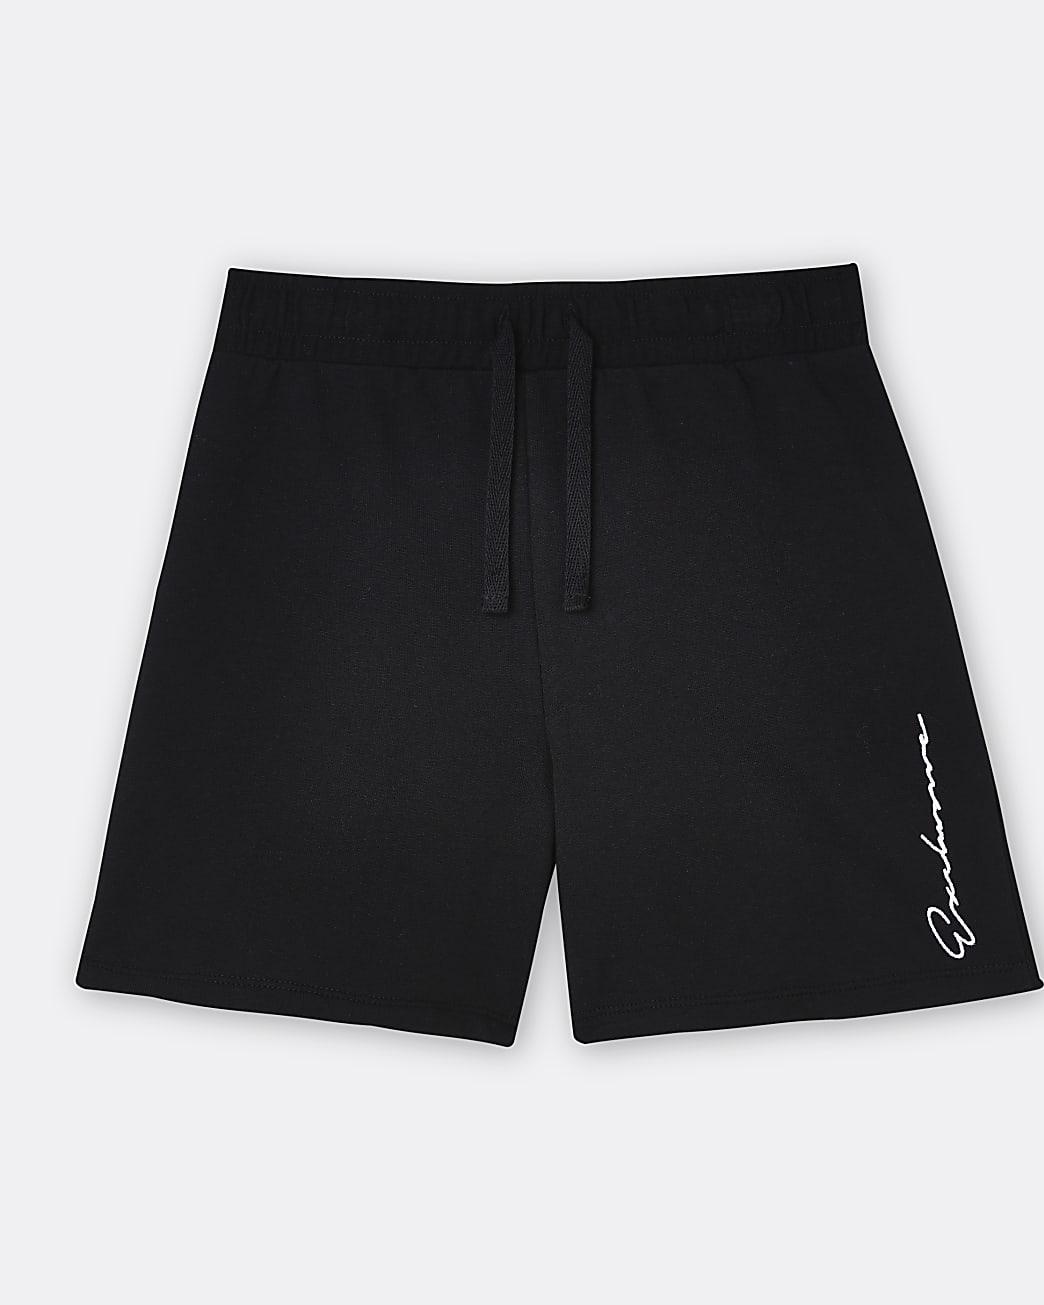 Boys black 'Exclusive' shorts